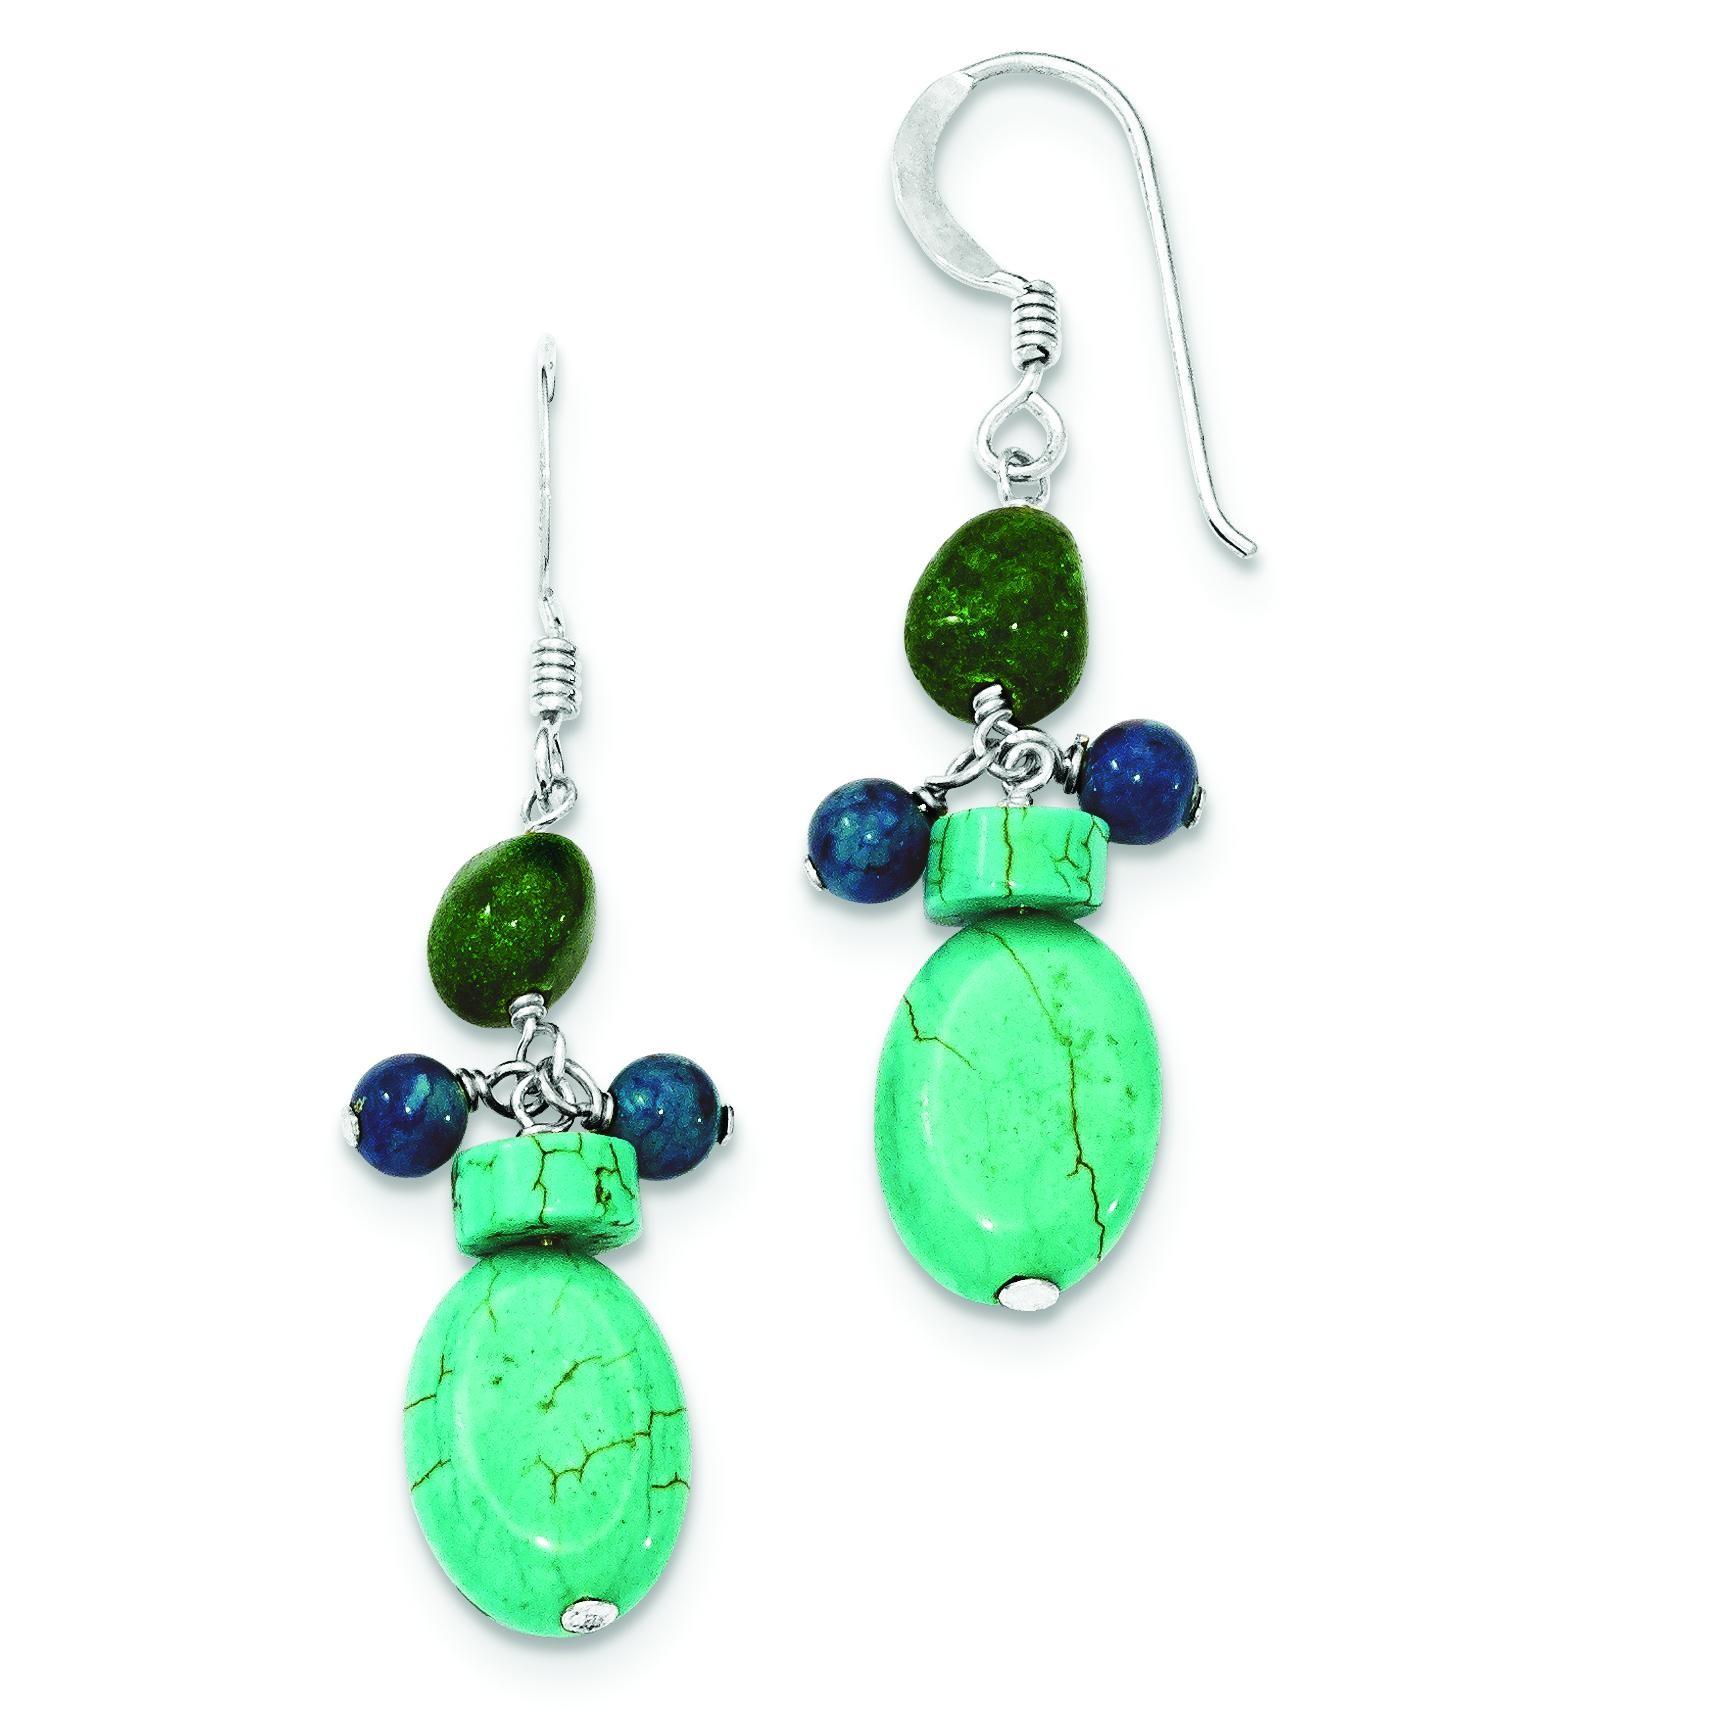 Aventurine Dyed Howlite Turquoise Blue Jade Earrings in Sterling Silver